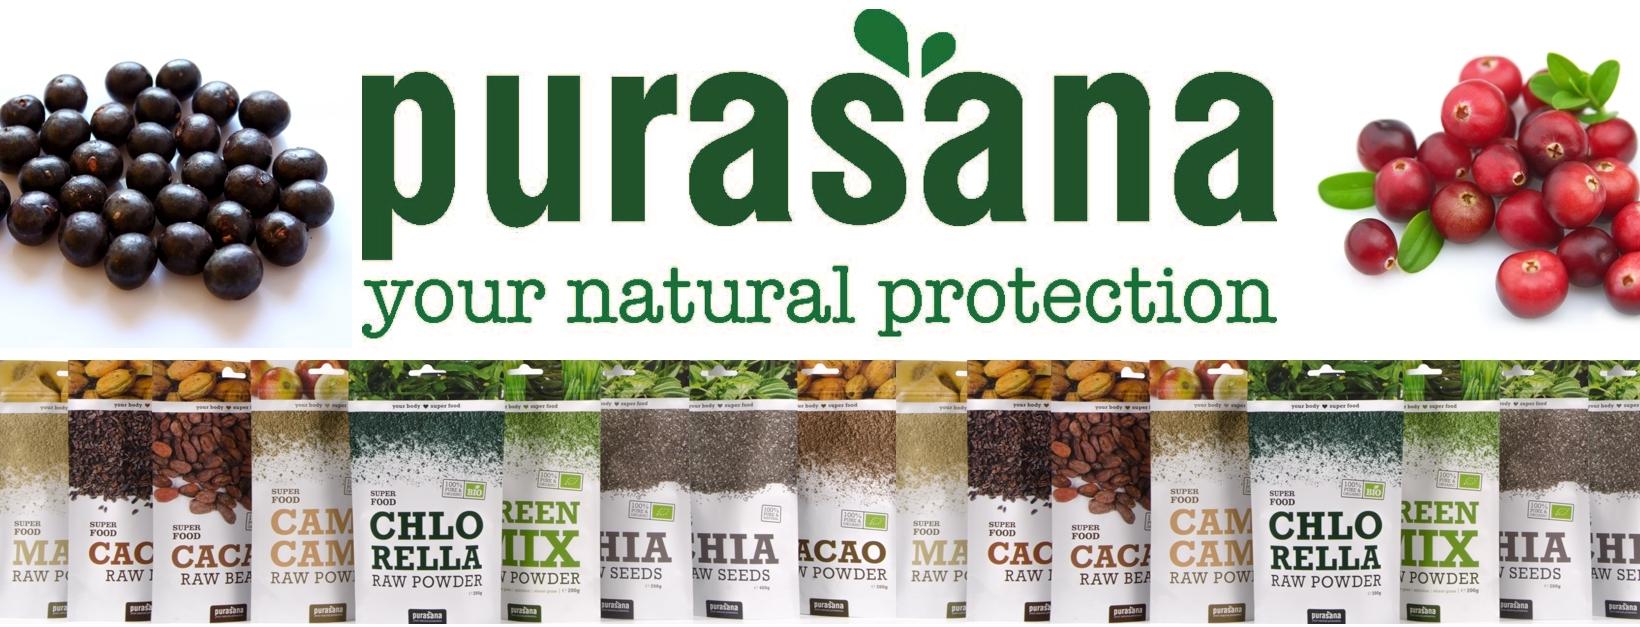 purasana-nice-complements alimentaires bio